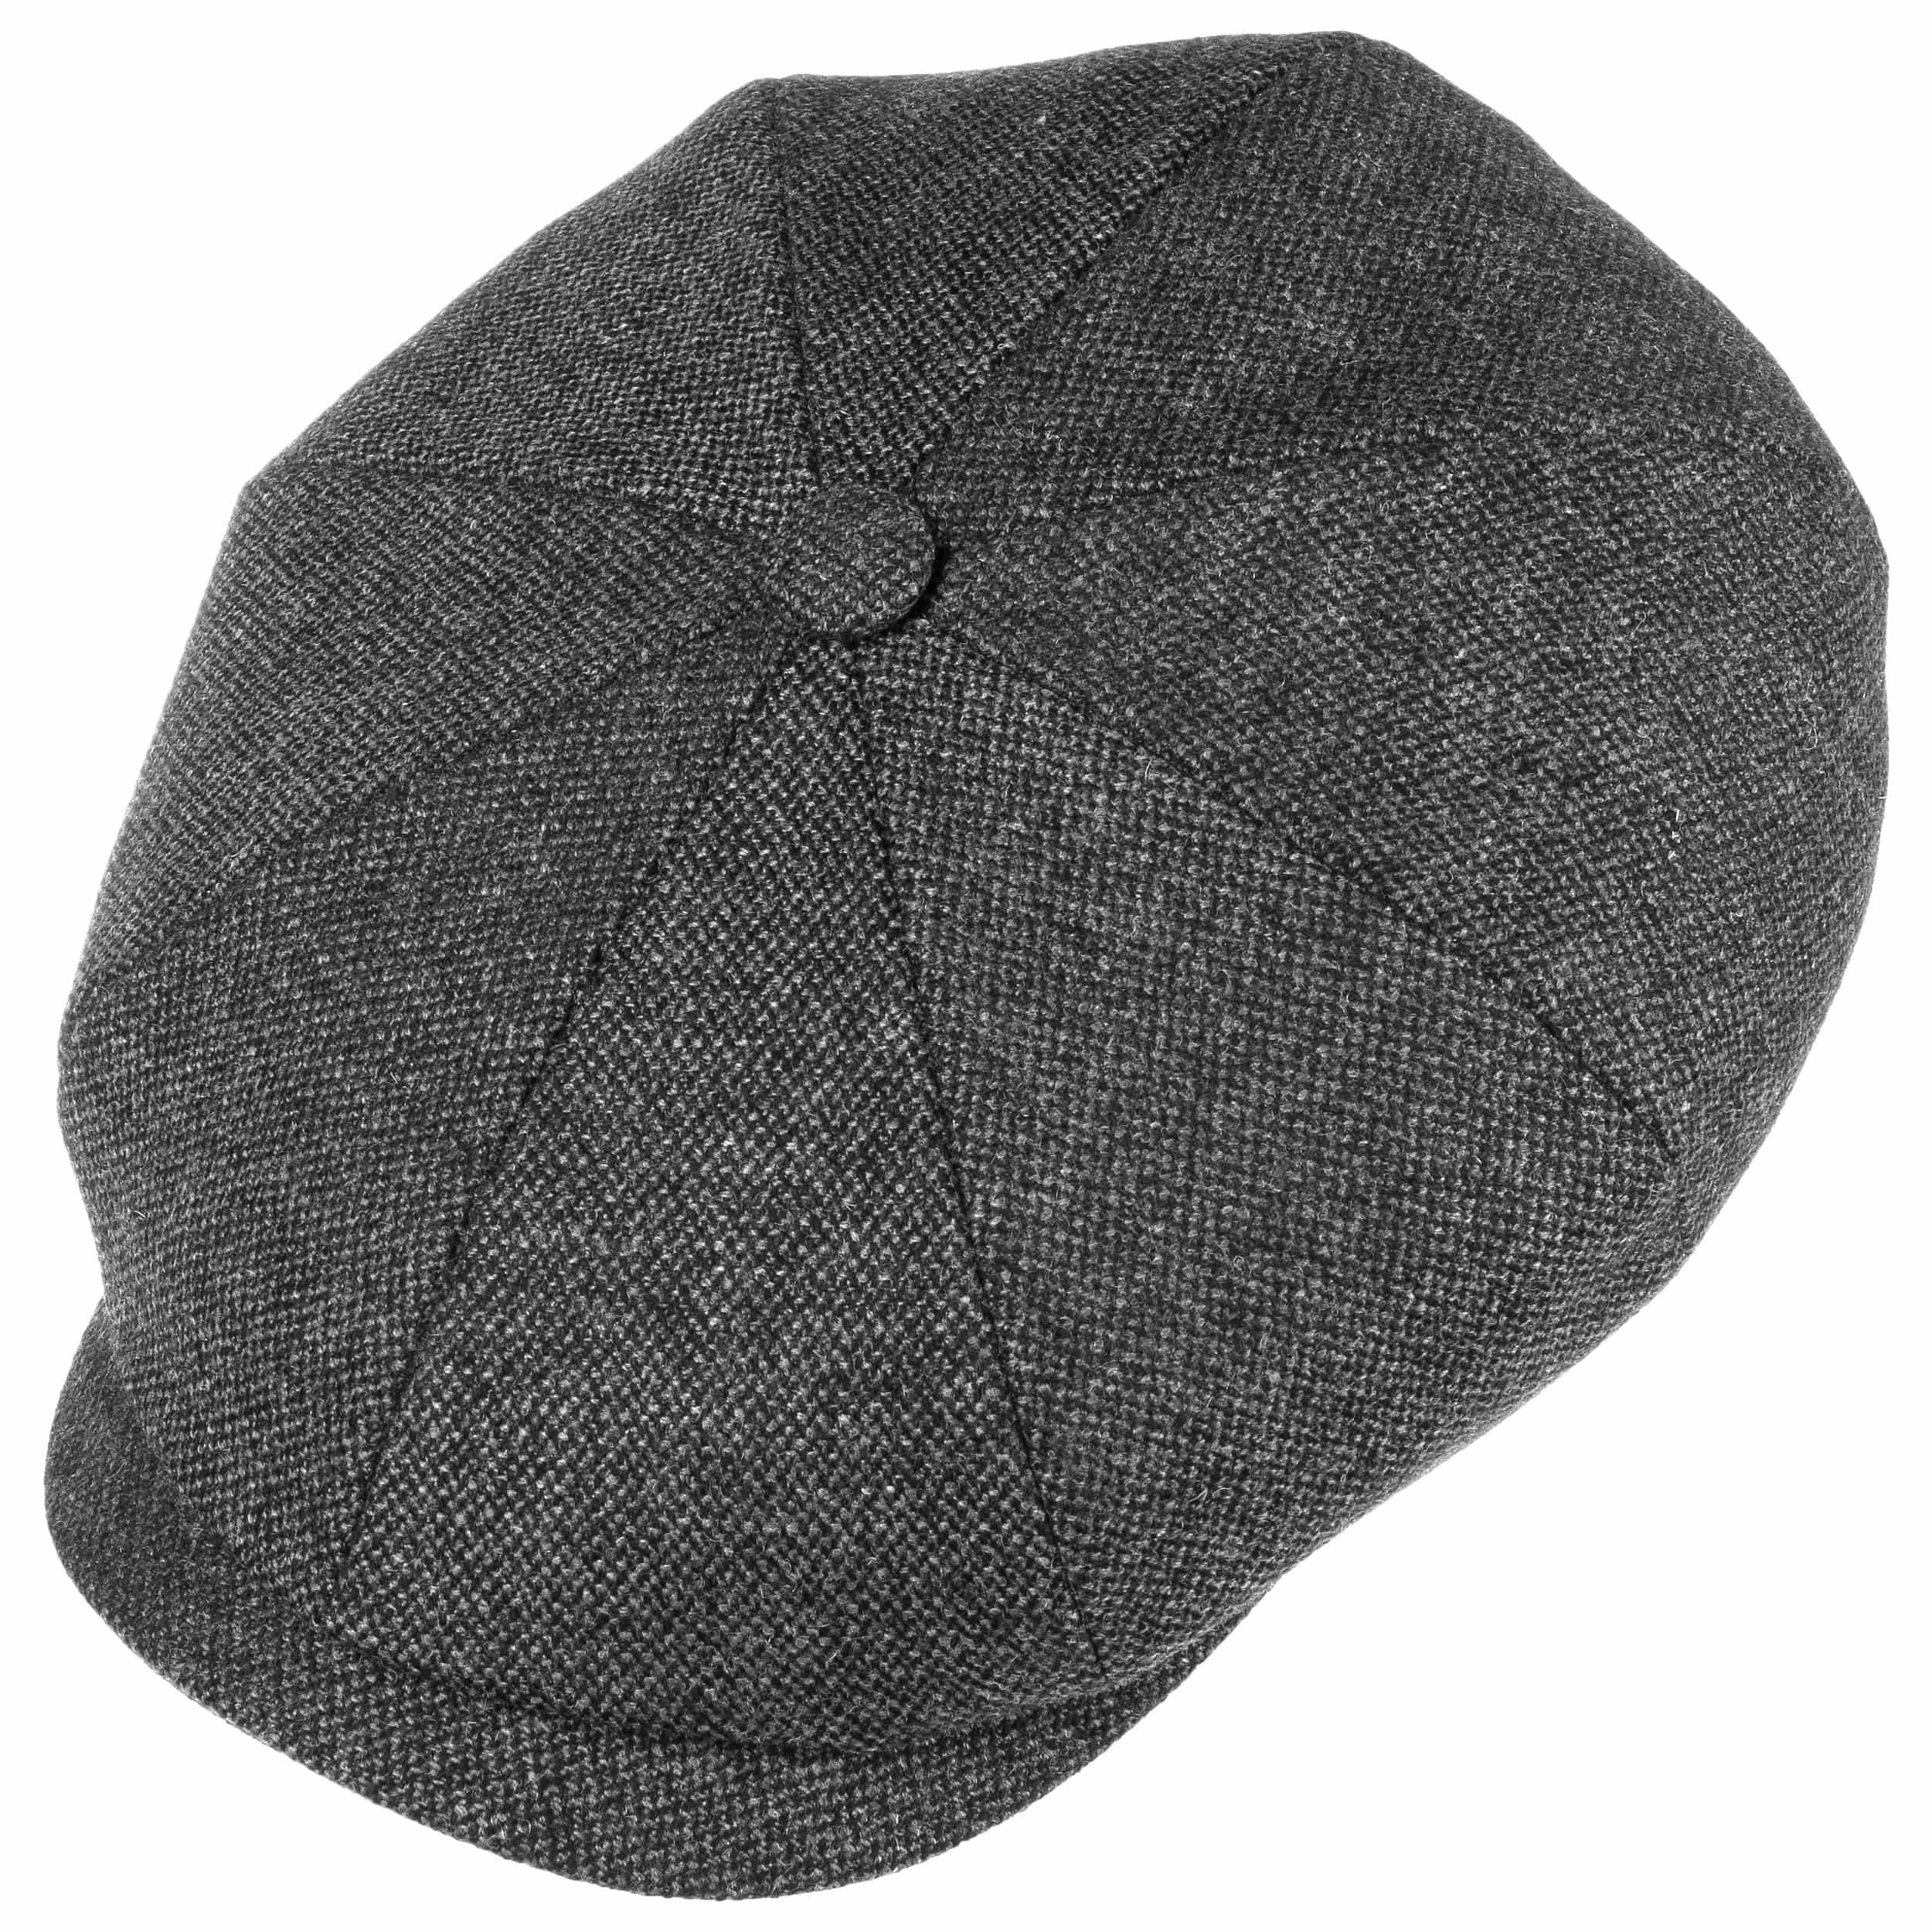 Hatteras Wool Mix Flatcap grau